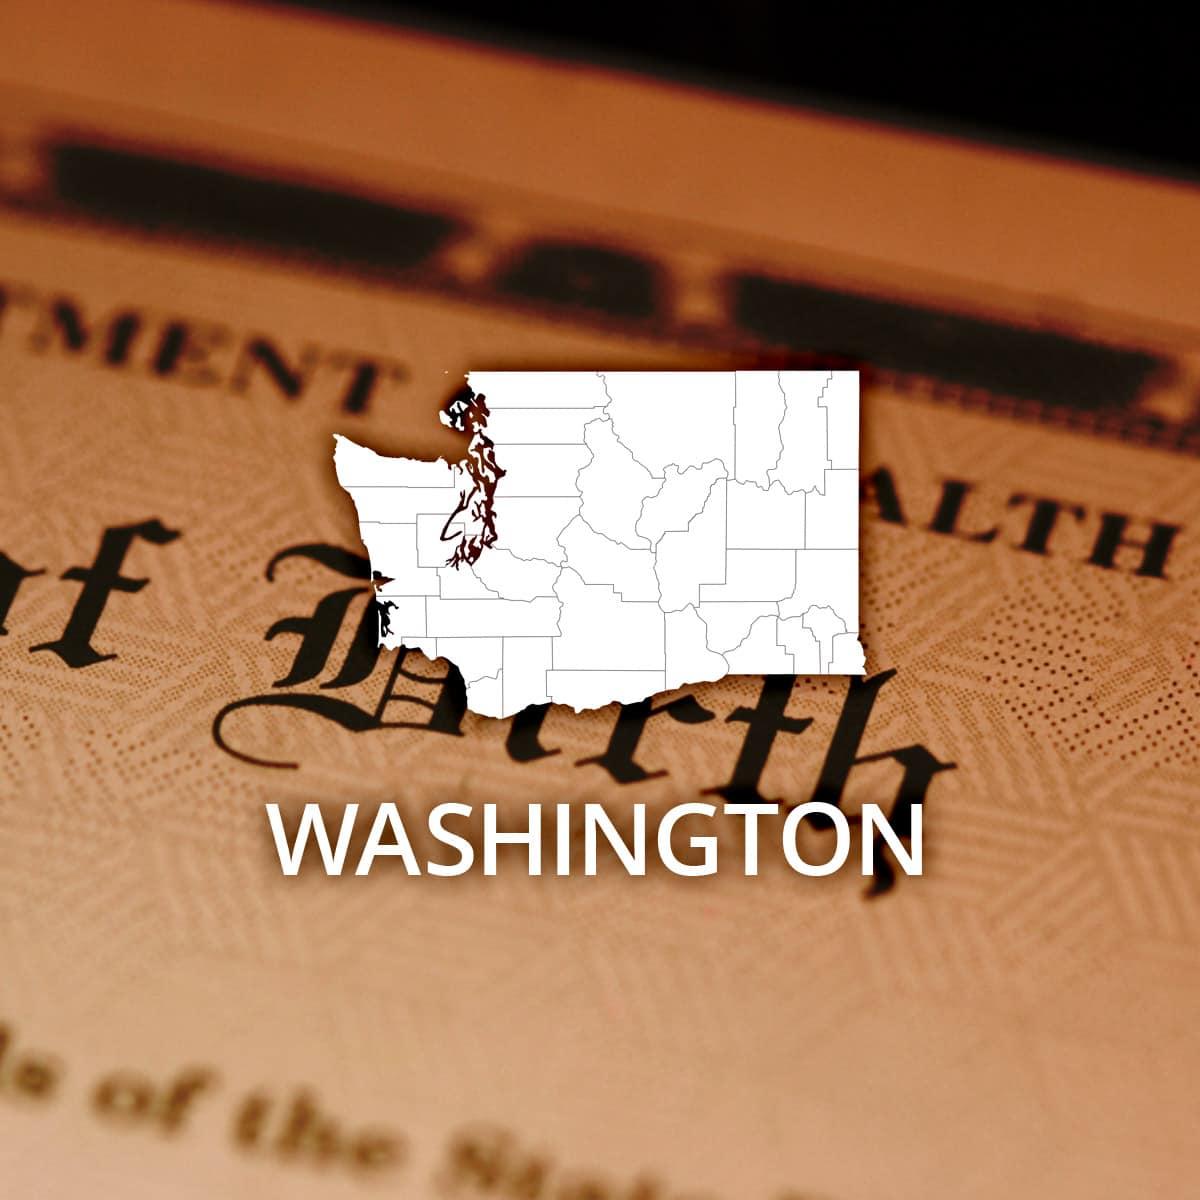 Where to Obtain a Washington Birth Certificate